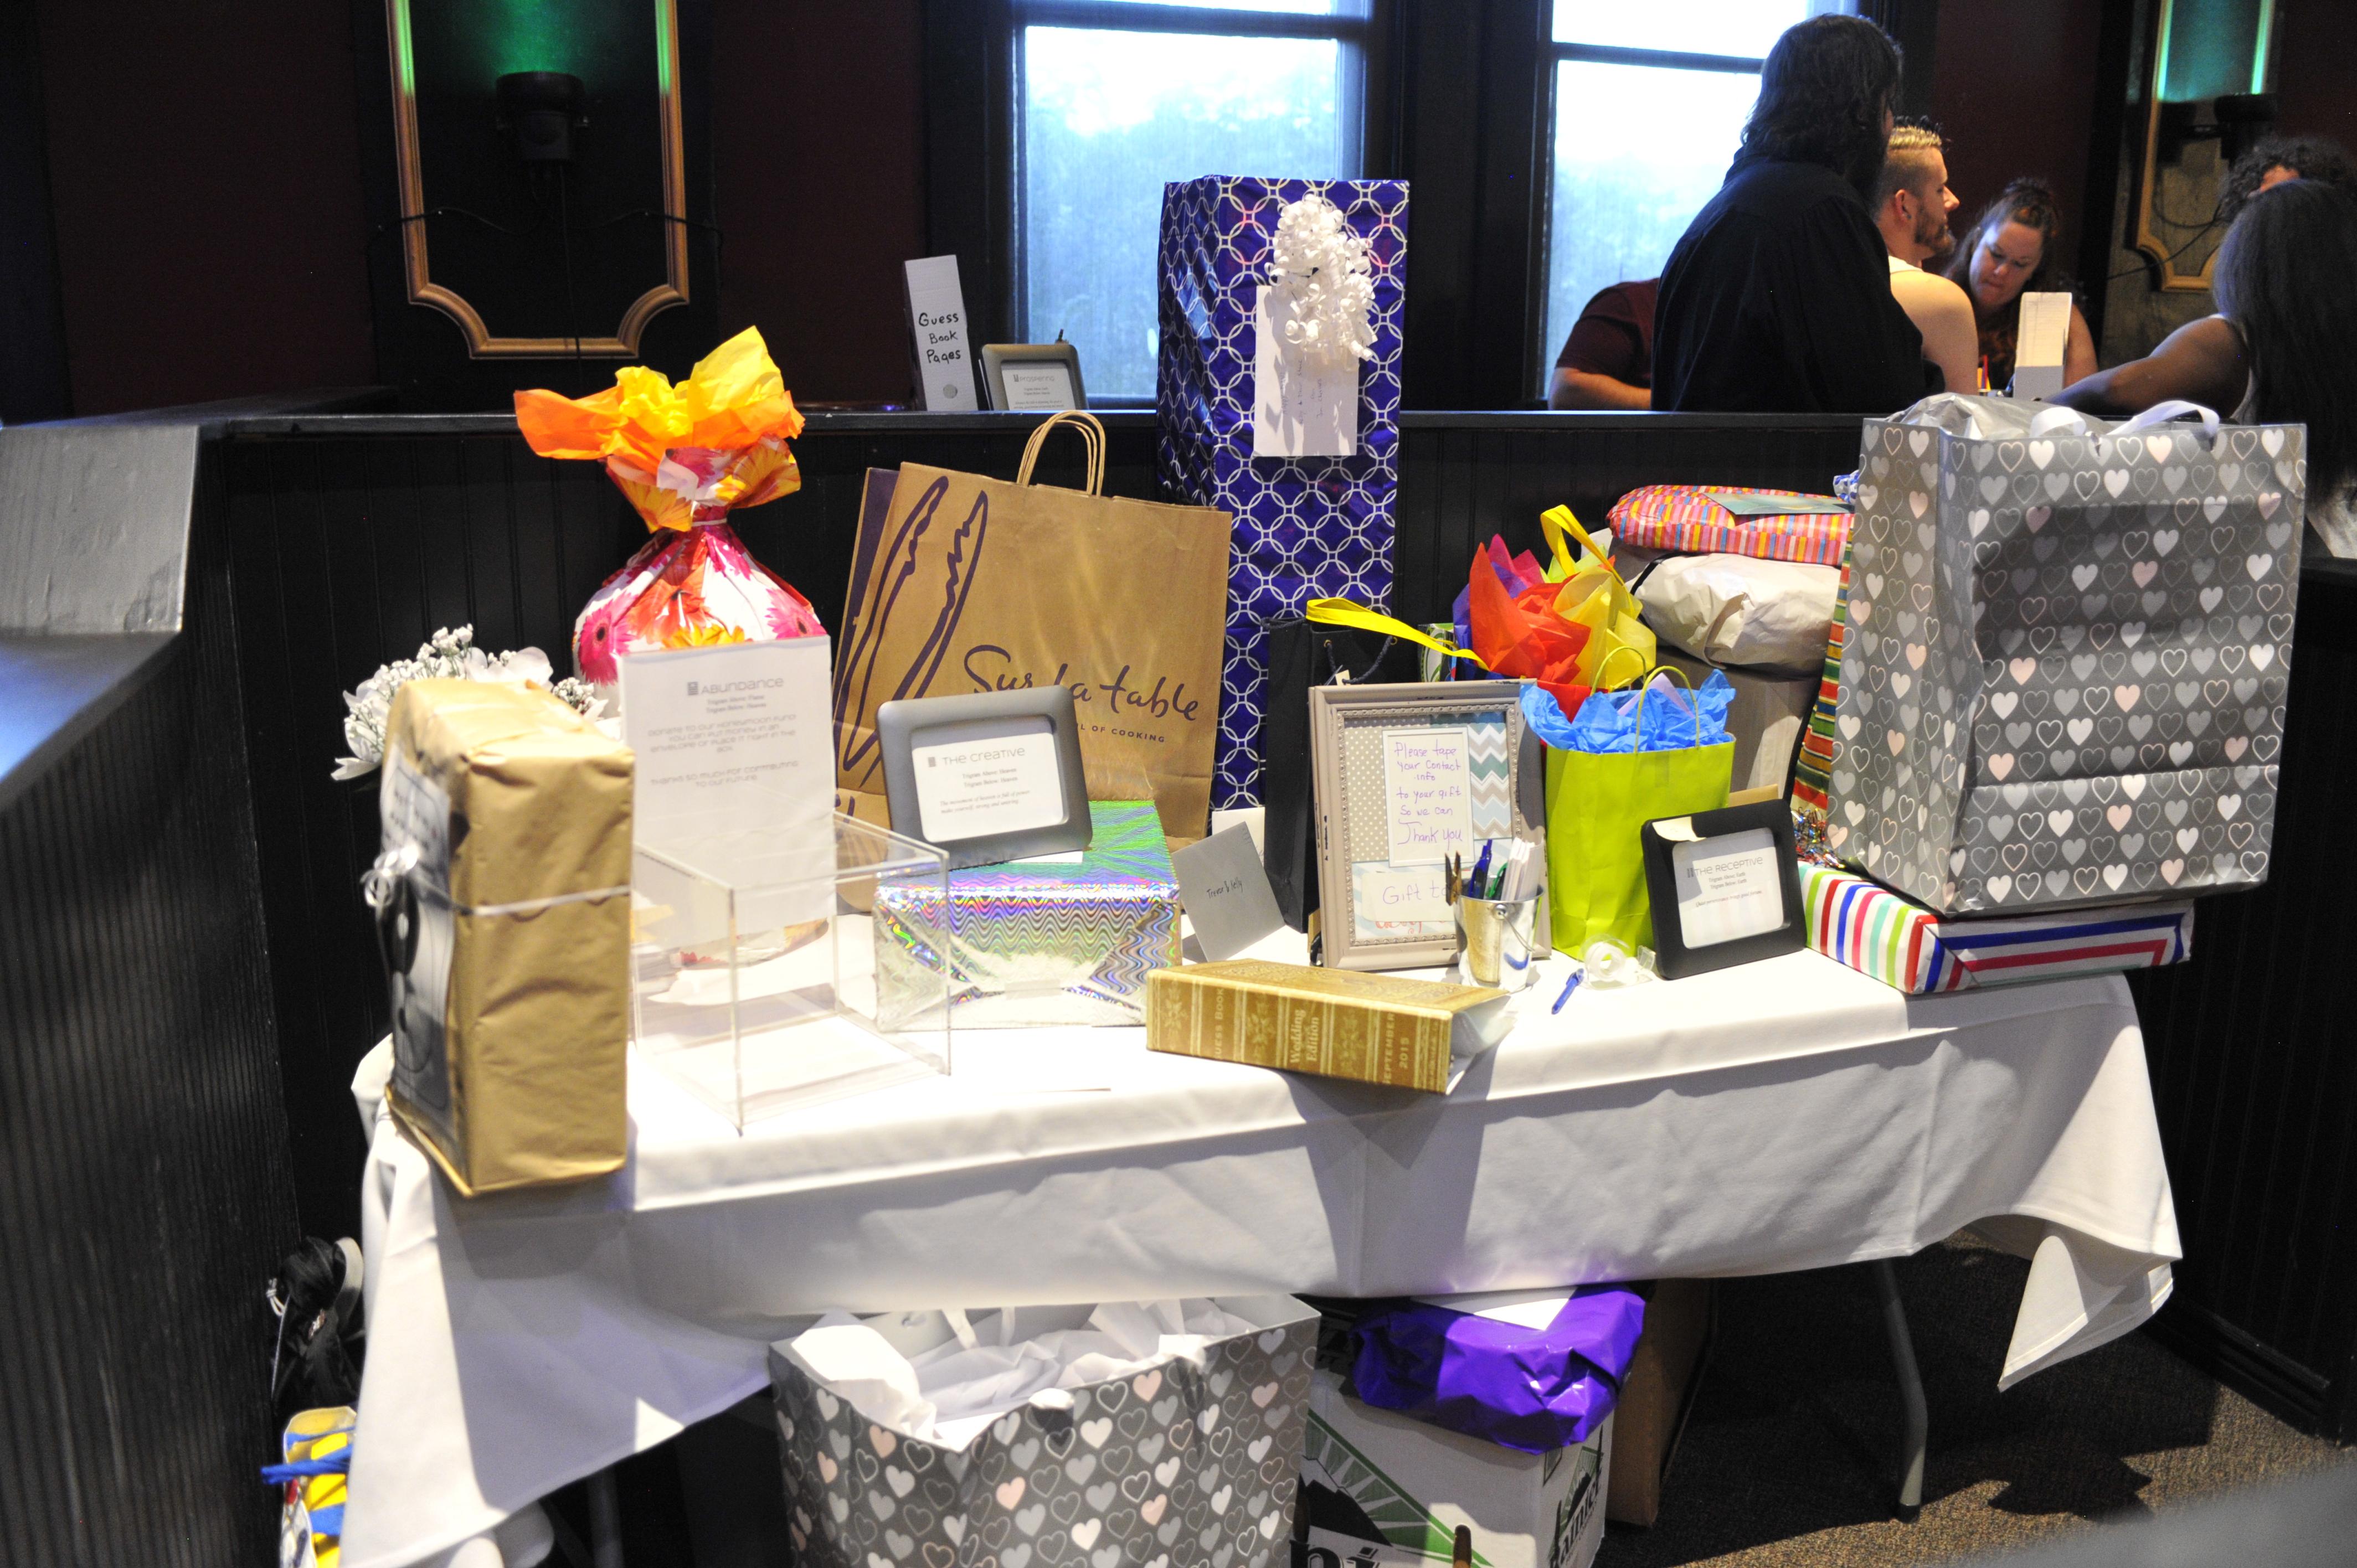 Photo: Our friends' overflowing generosity